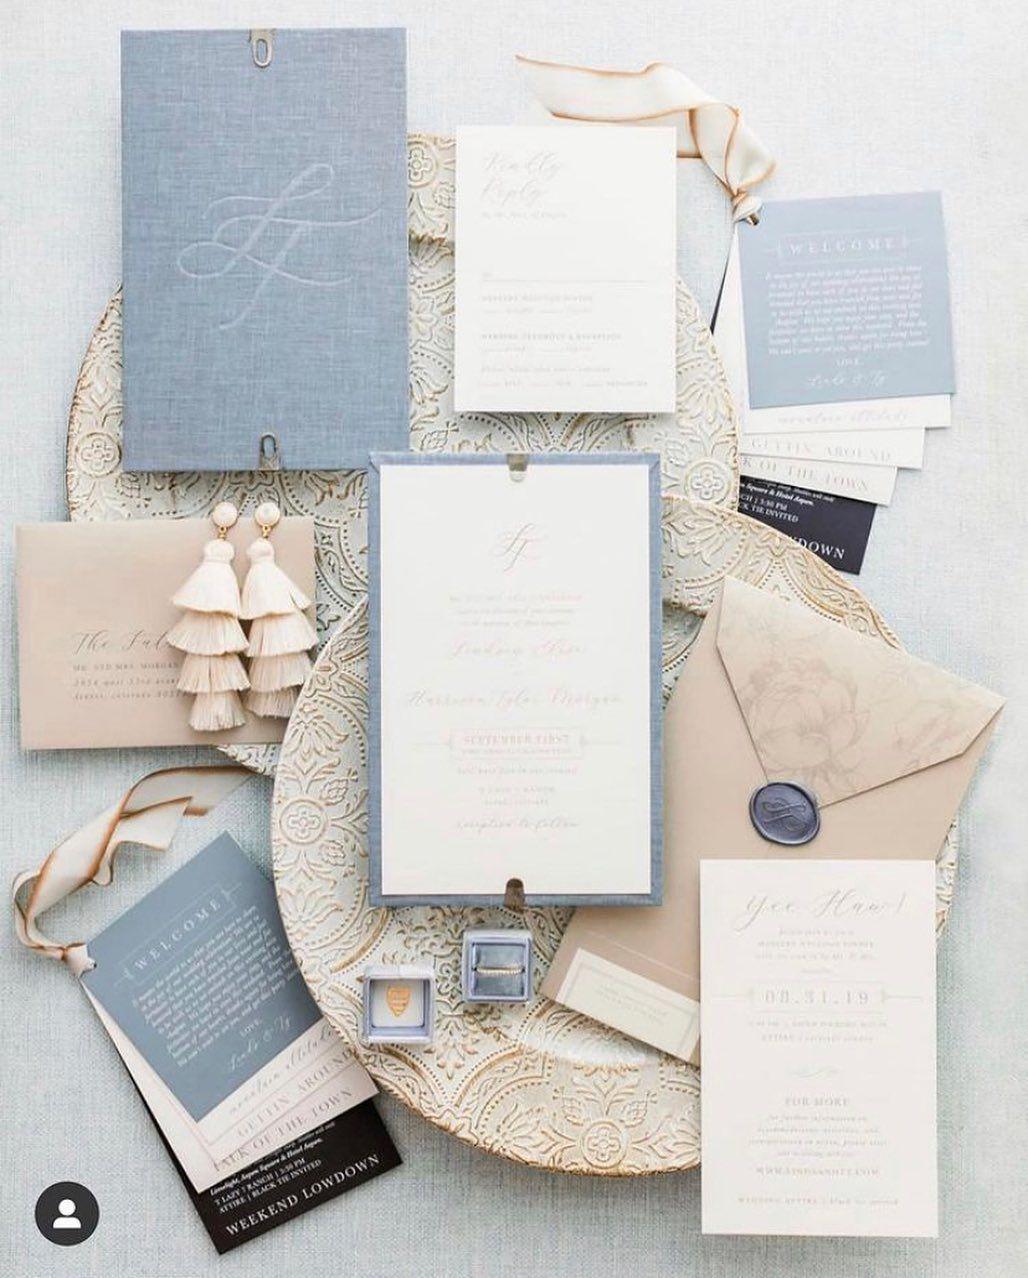 Aspen Weddings On Instagram It S All About The Details Belloandbluee In 2021 Wedding Invitations Stationery Bespoke Wedding Stationery Wedding Stationery